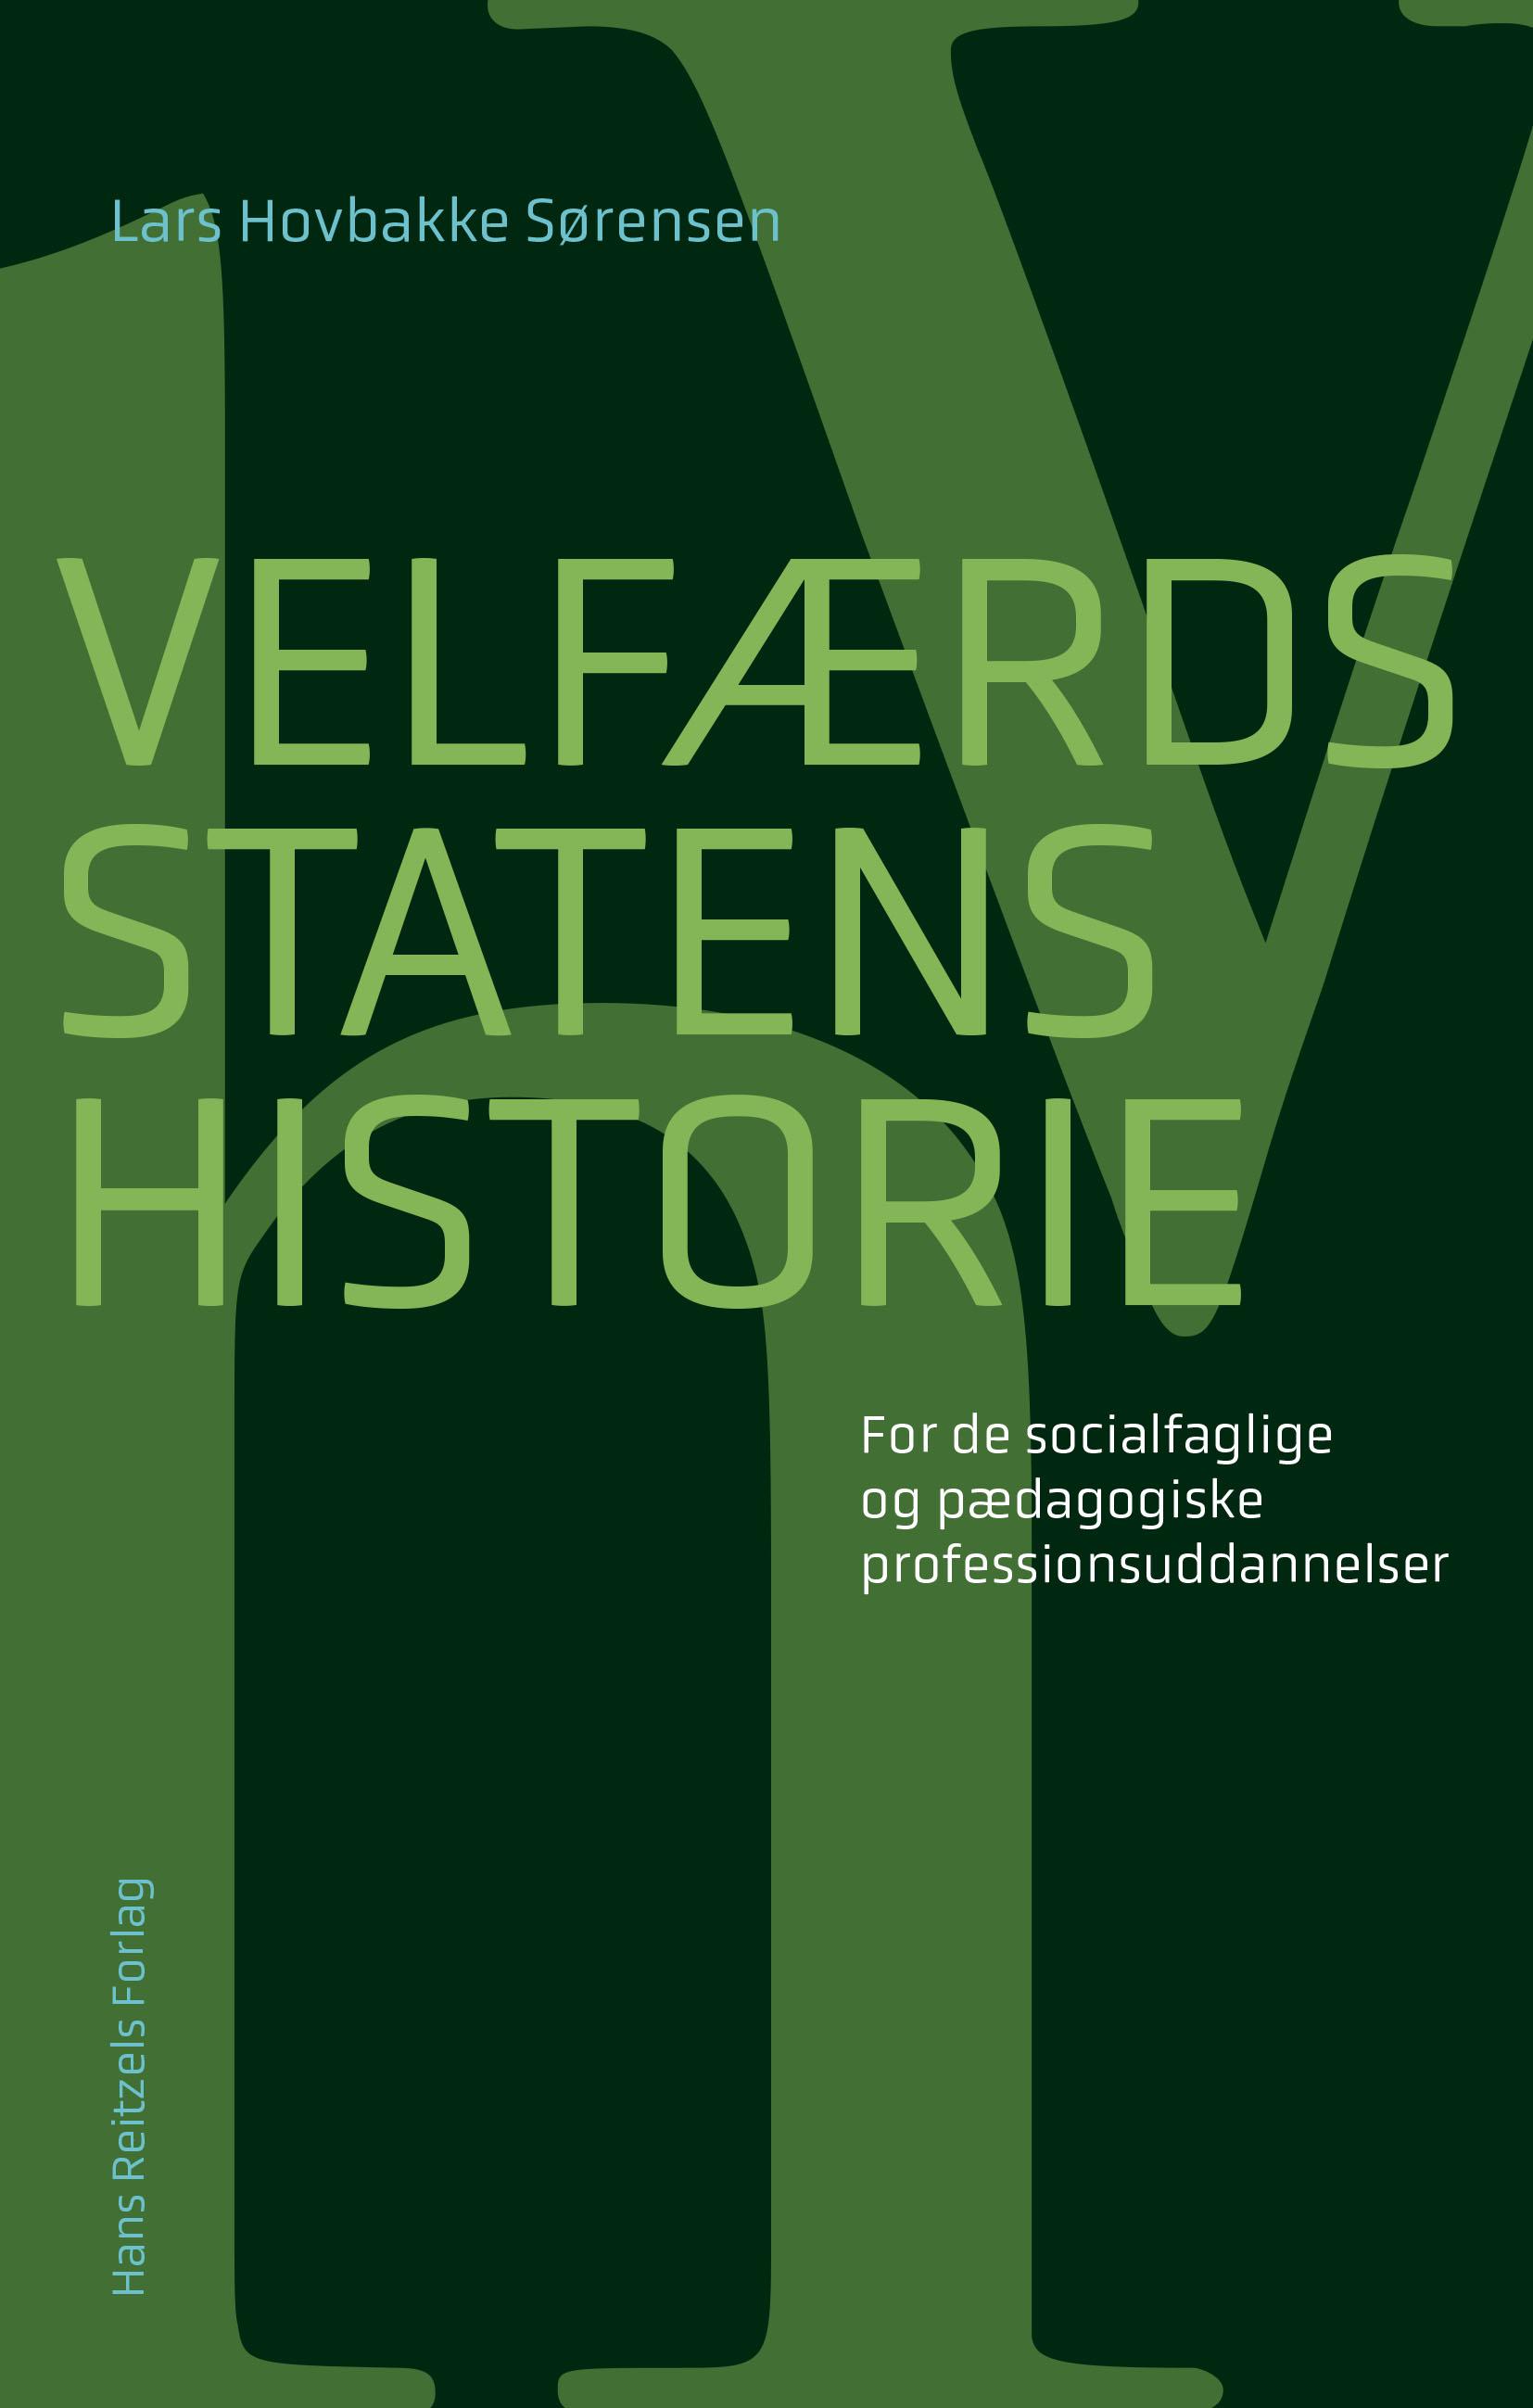 Velfærdsstatens historie